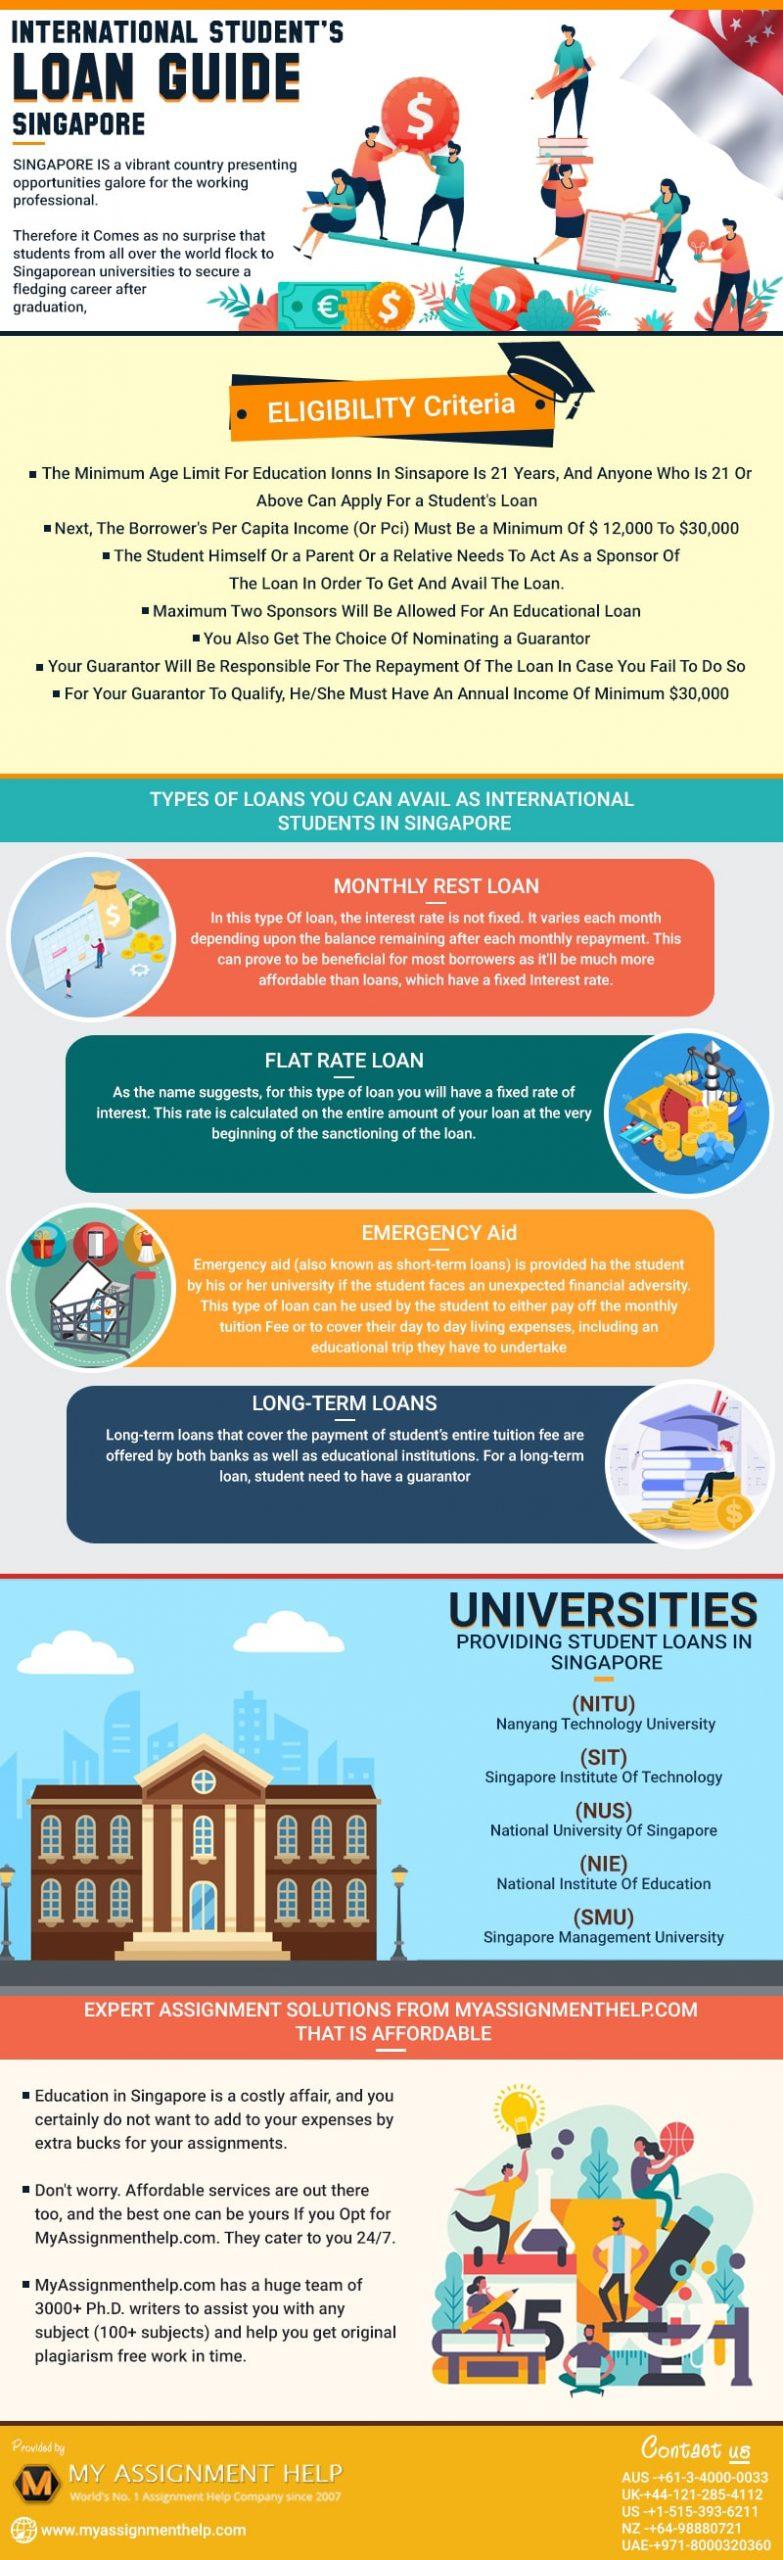 International Students Loan